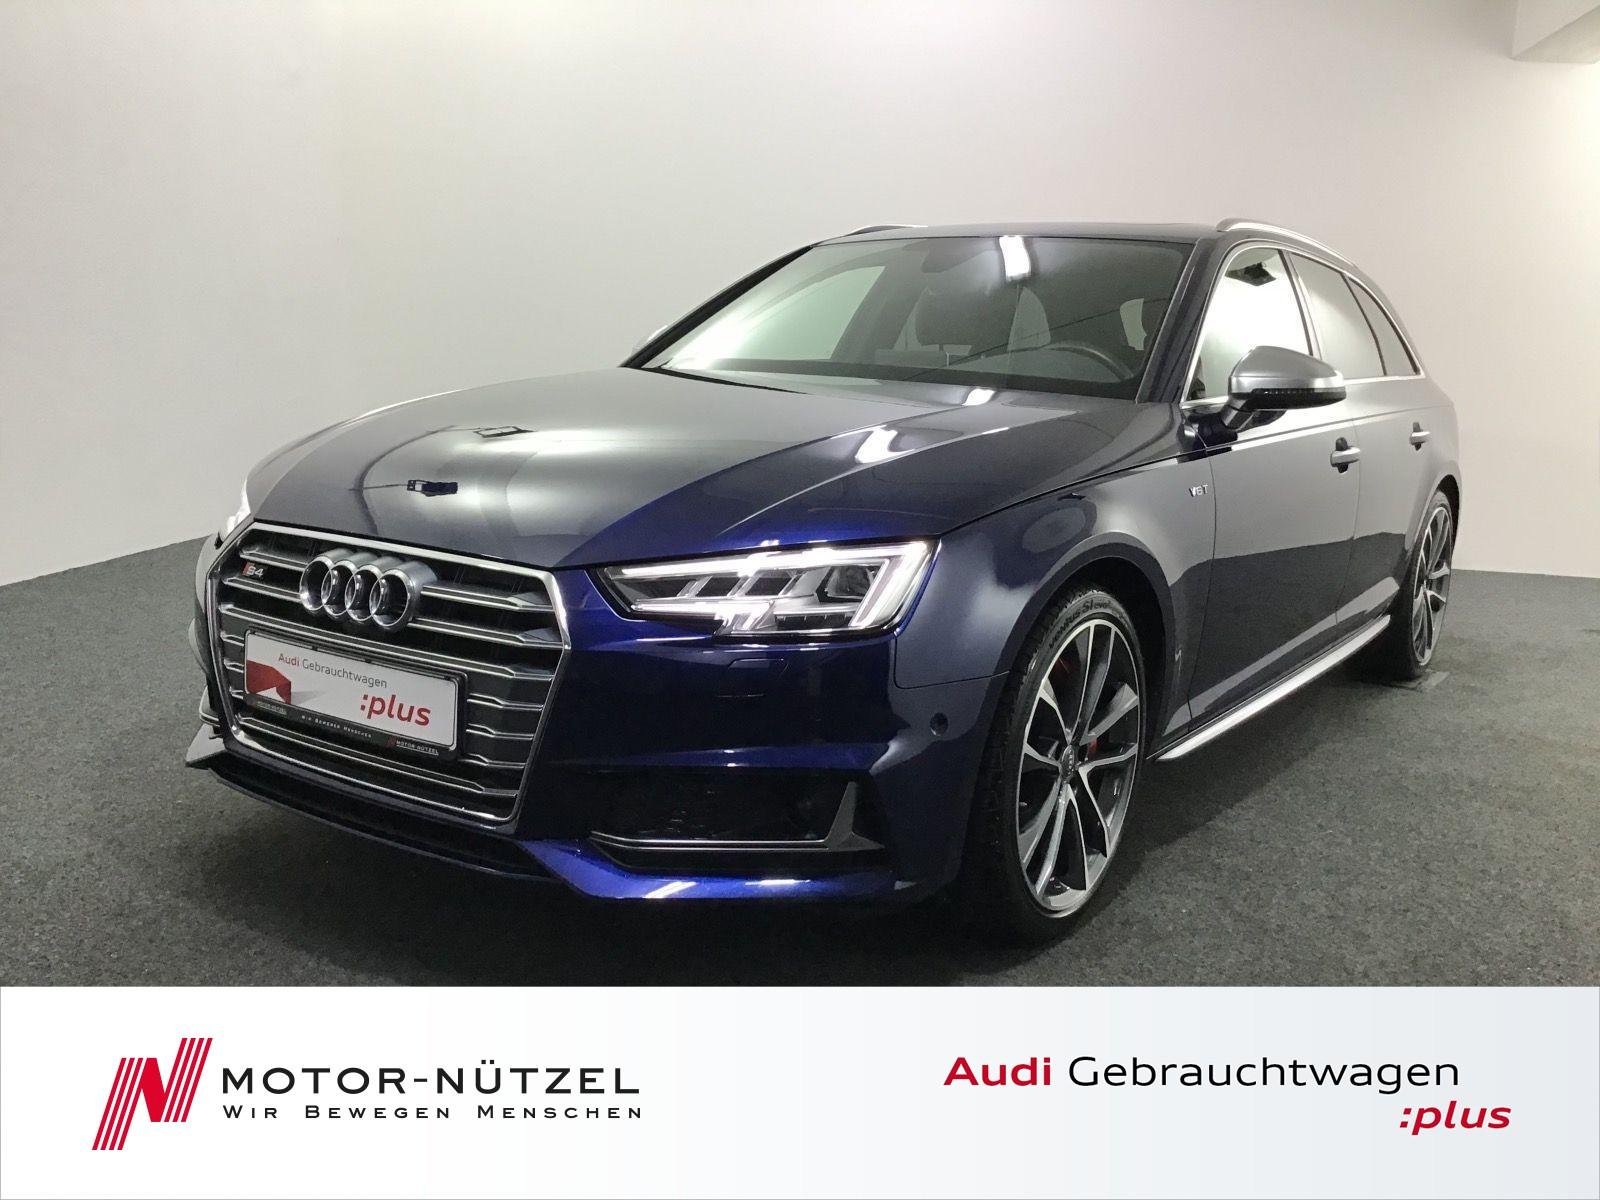 Audi S4 Avant TFSI quattro +AHK+PanoDach+AssistPakete, Jahr 2017, Benzin